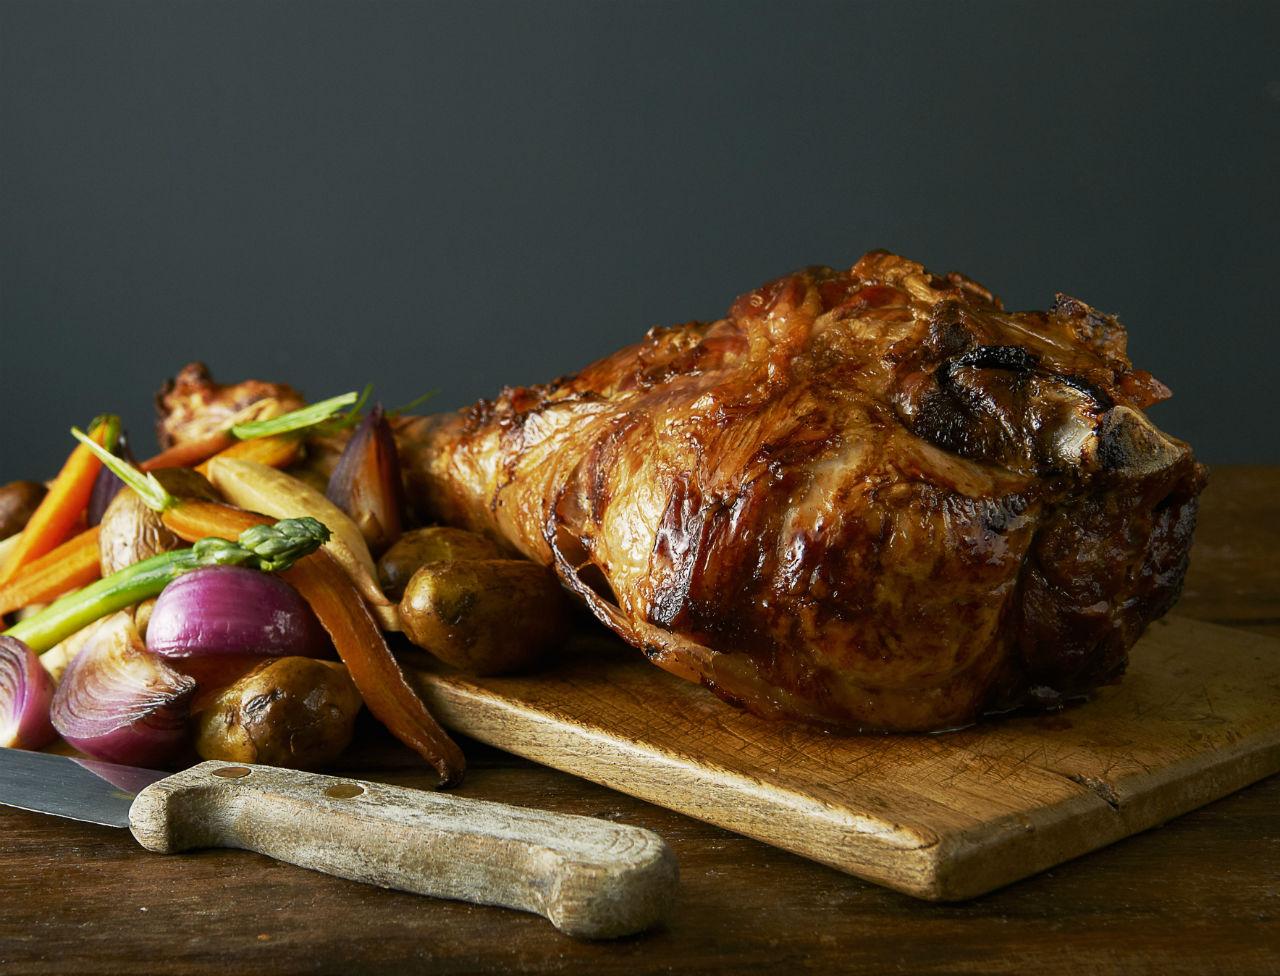 Cuisiner un gigot d agneau inspiration de conception de - Cuisiner les restes de gigot d agneau ...